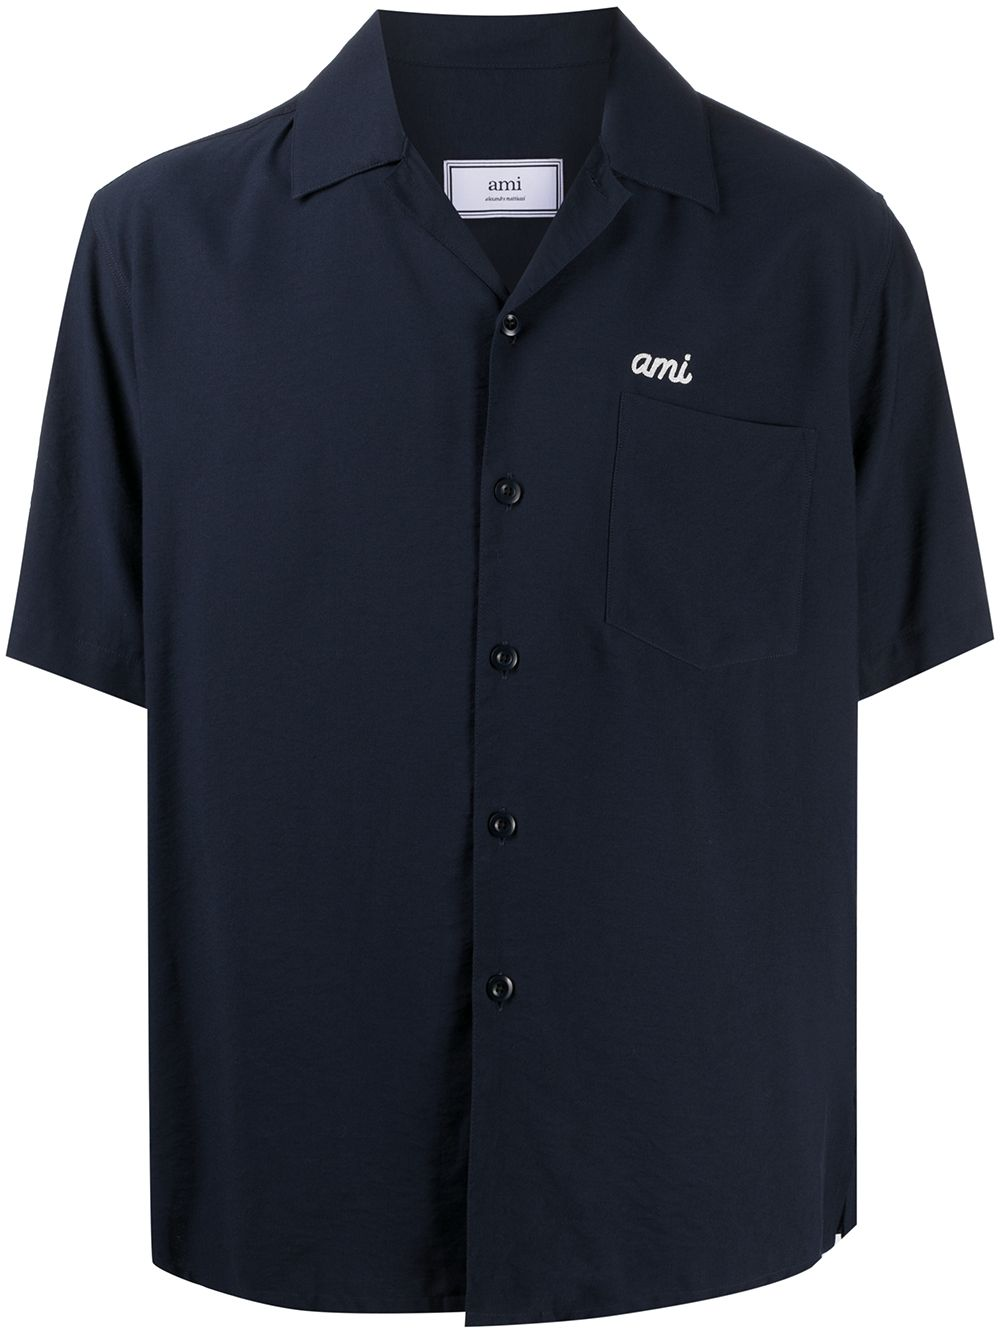 EMBROIDERED LOGO SHIRT AMI - ALEXANDRE MATTIUSSI | Shirts | E21HC200.452410